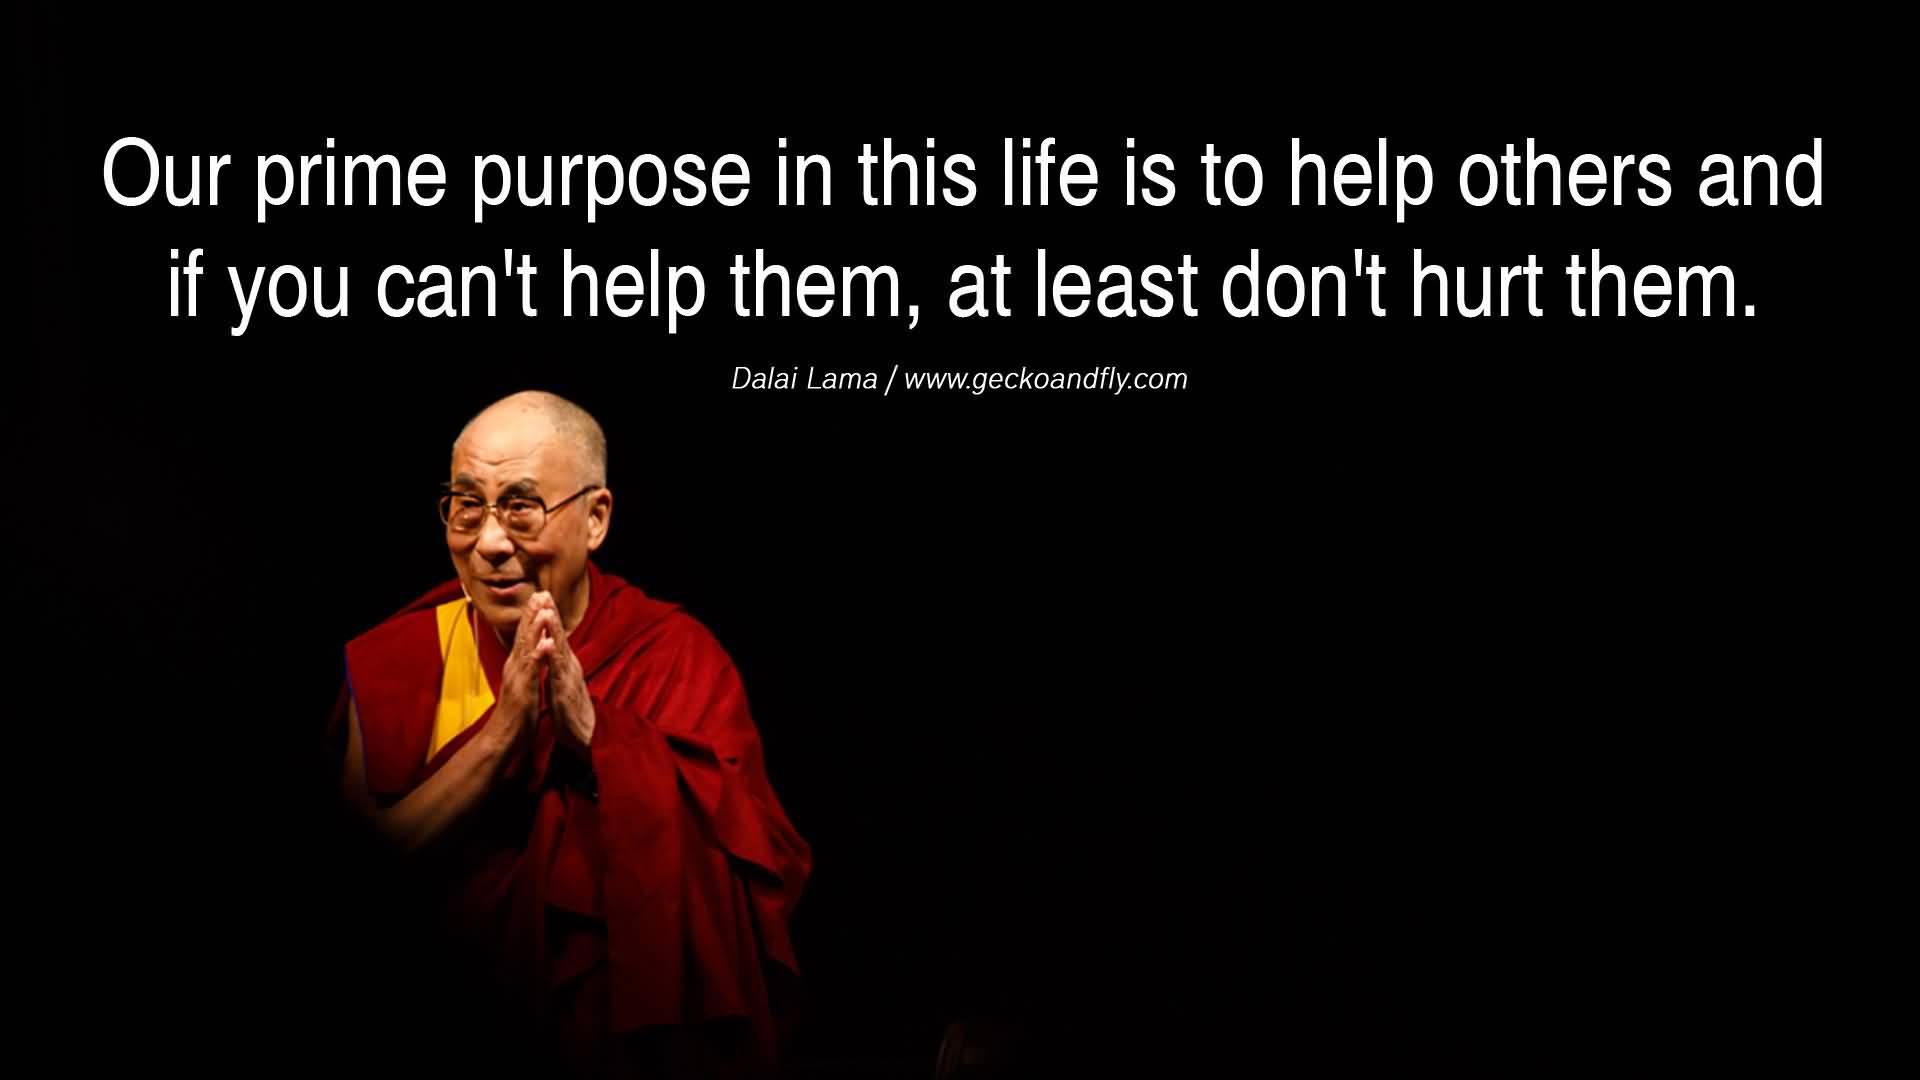 Dalai Lama Quotes Life 11